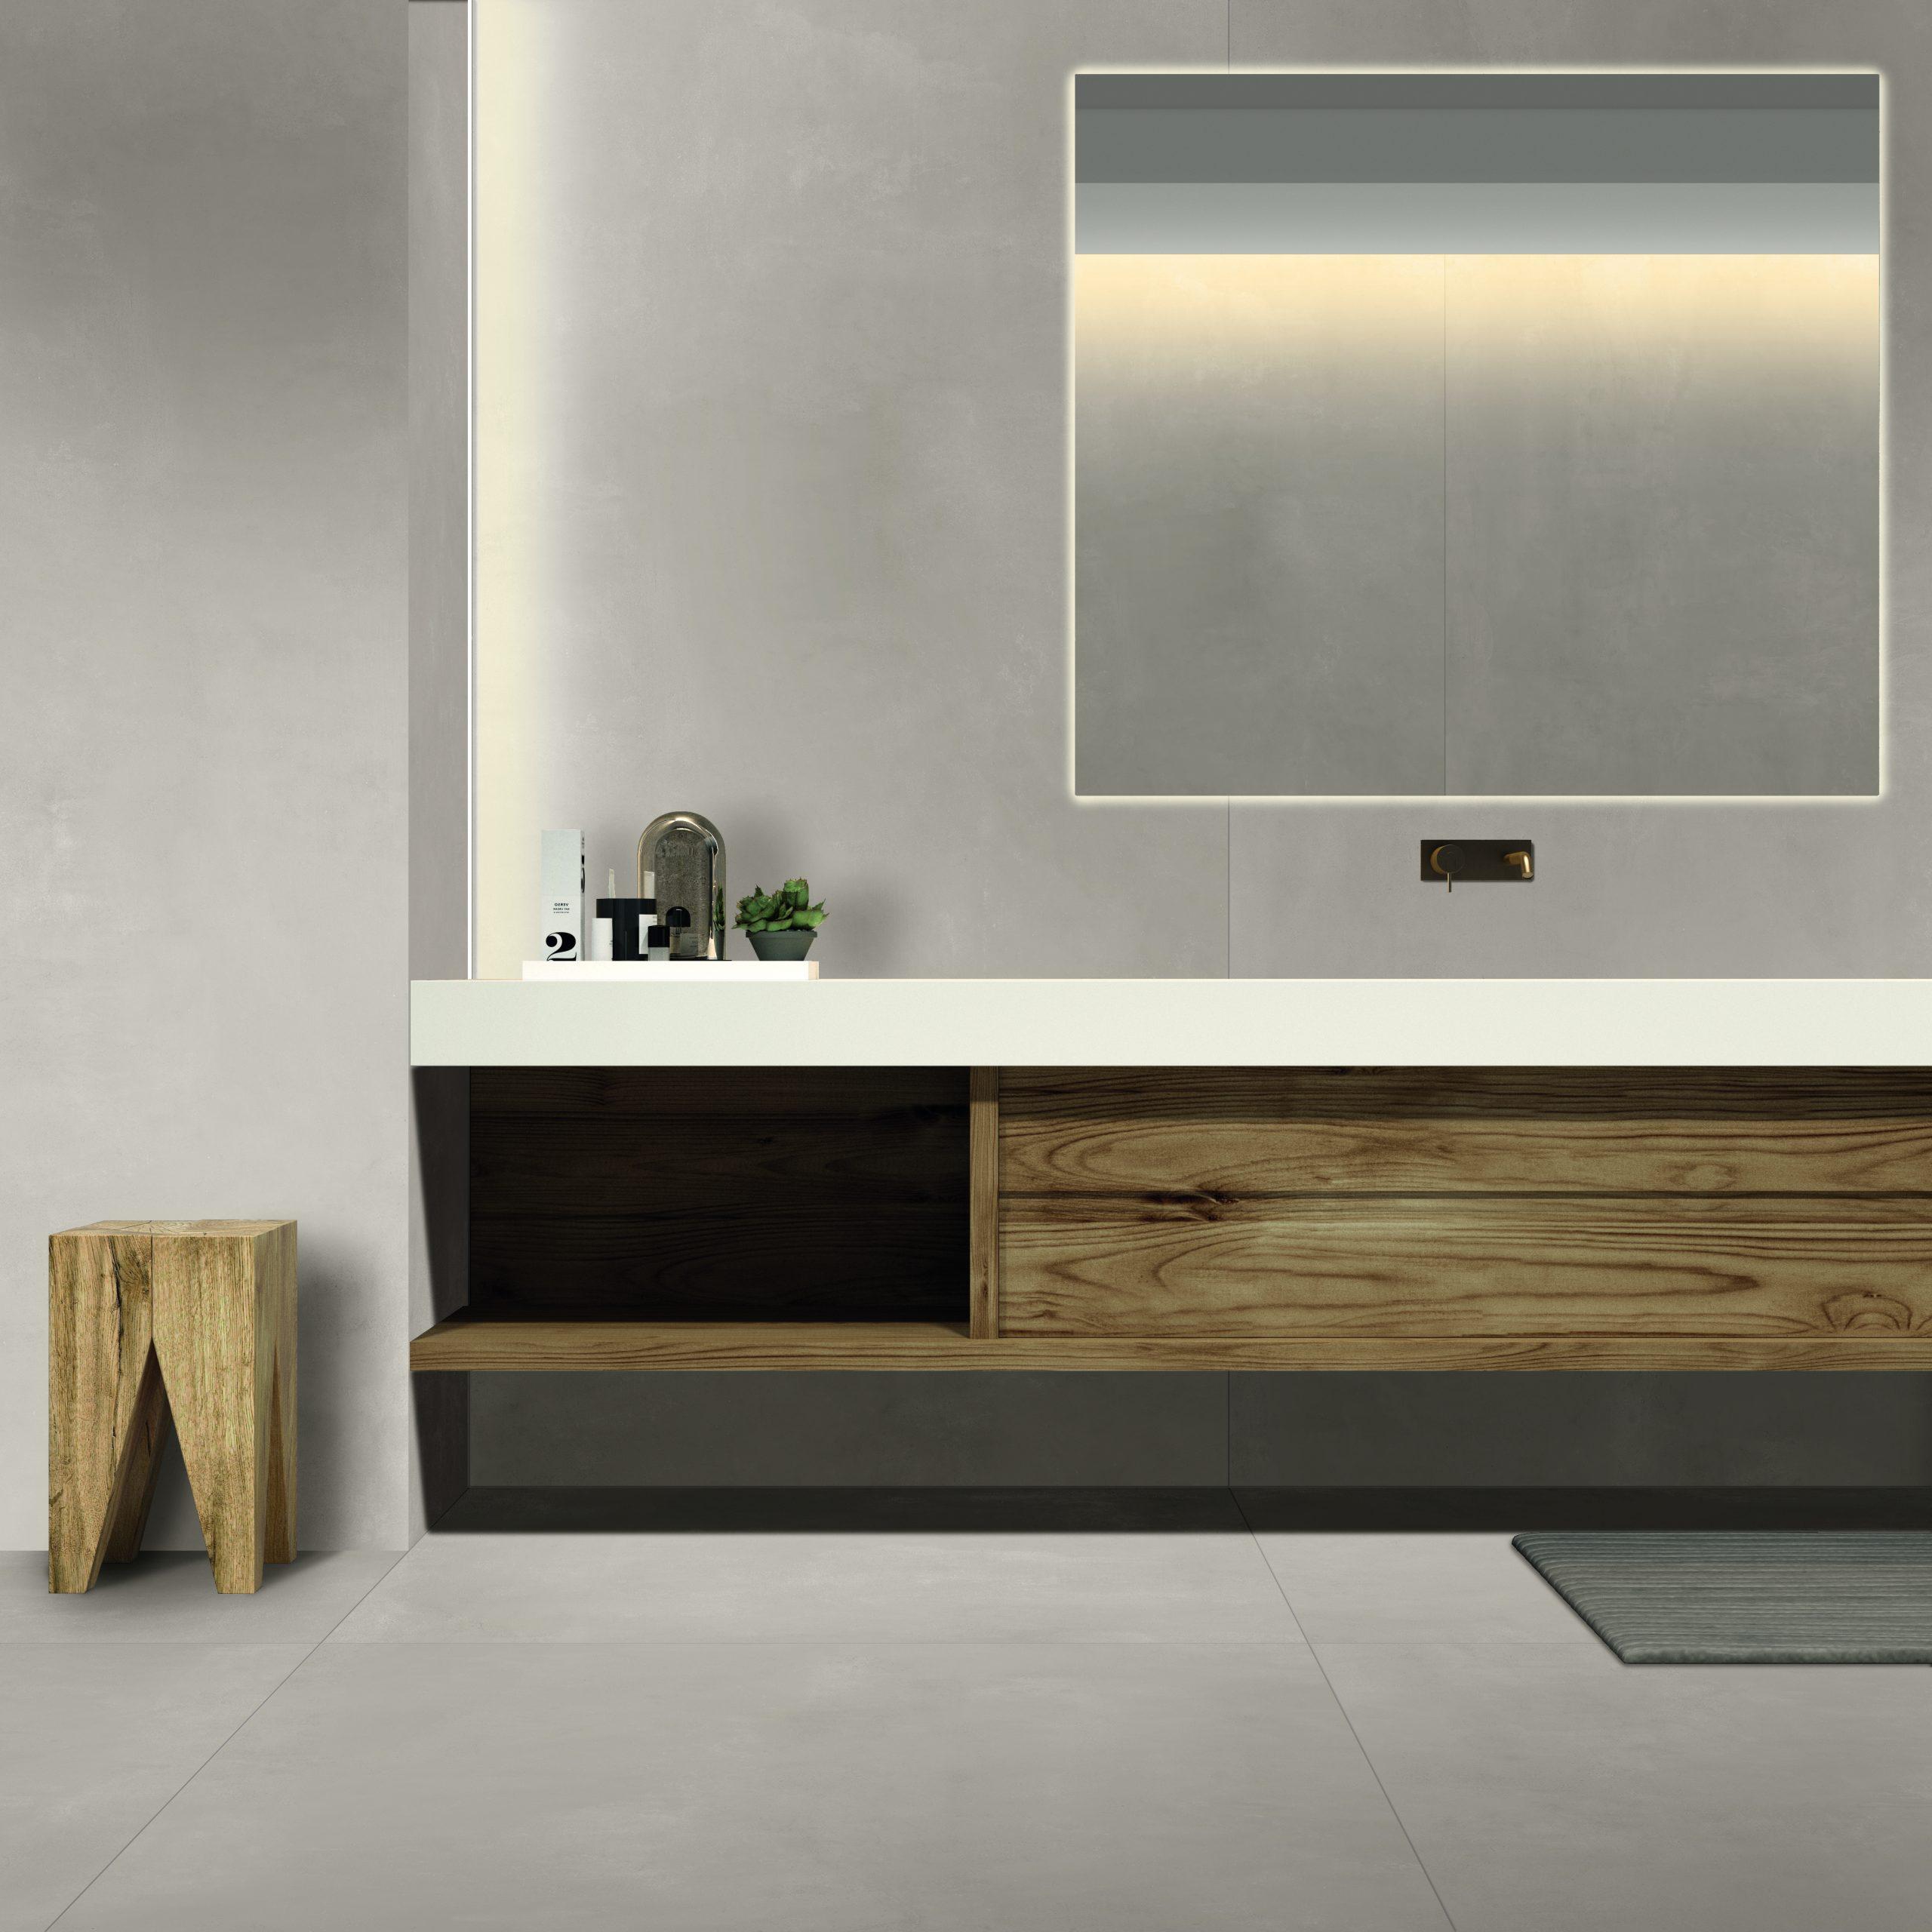 Mijnbadinstijl-stiles-italiaanse-tegels-badkamer-wand